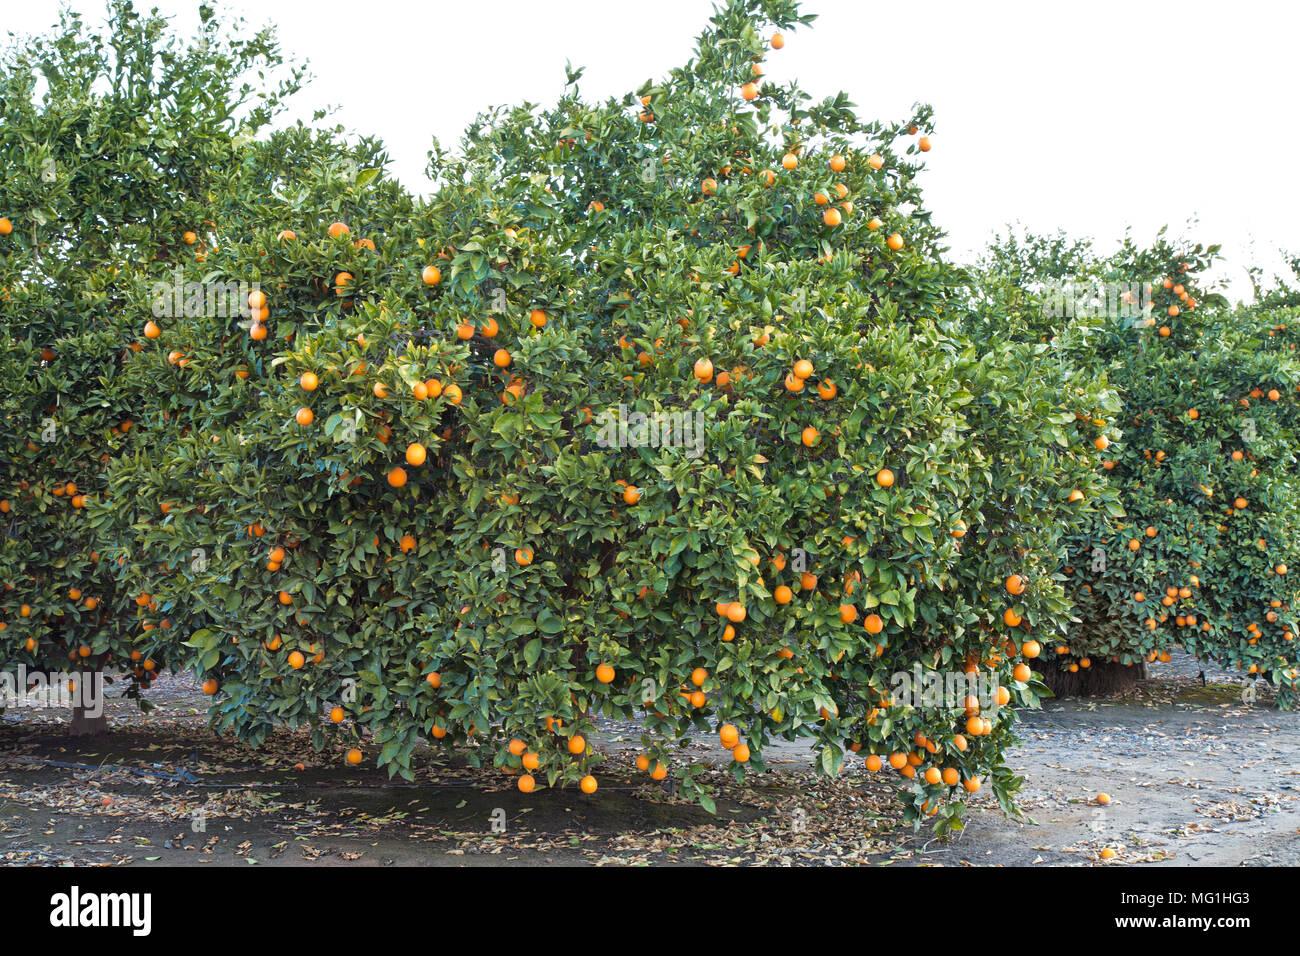 Maturing Cutter nucellar Valencia Oranges on tree 'Citrus sinensis'. - Stock Image